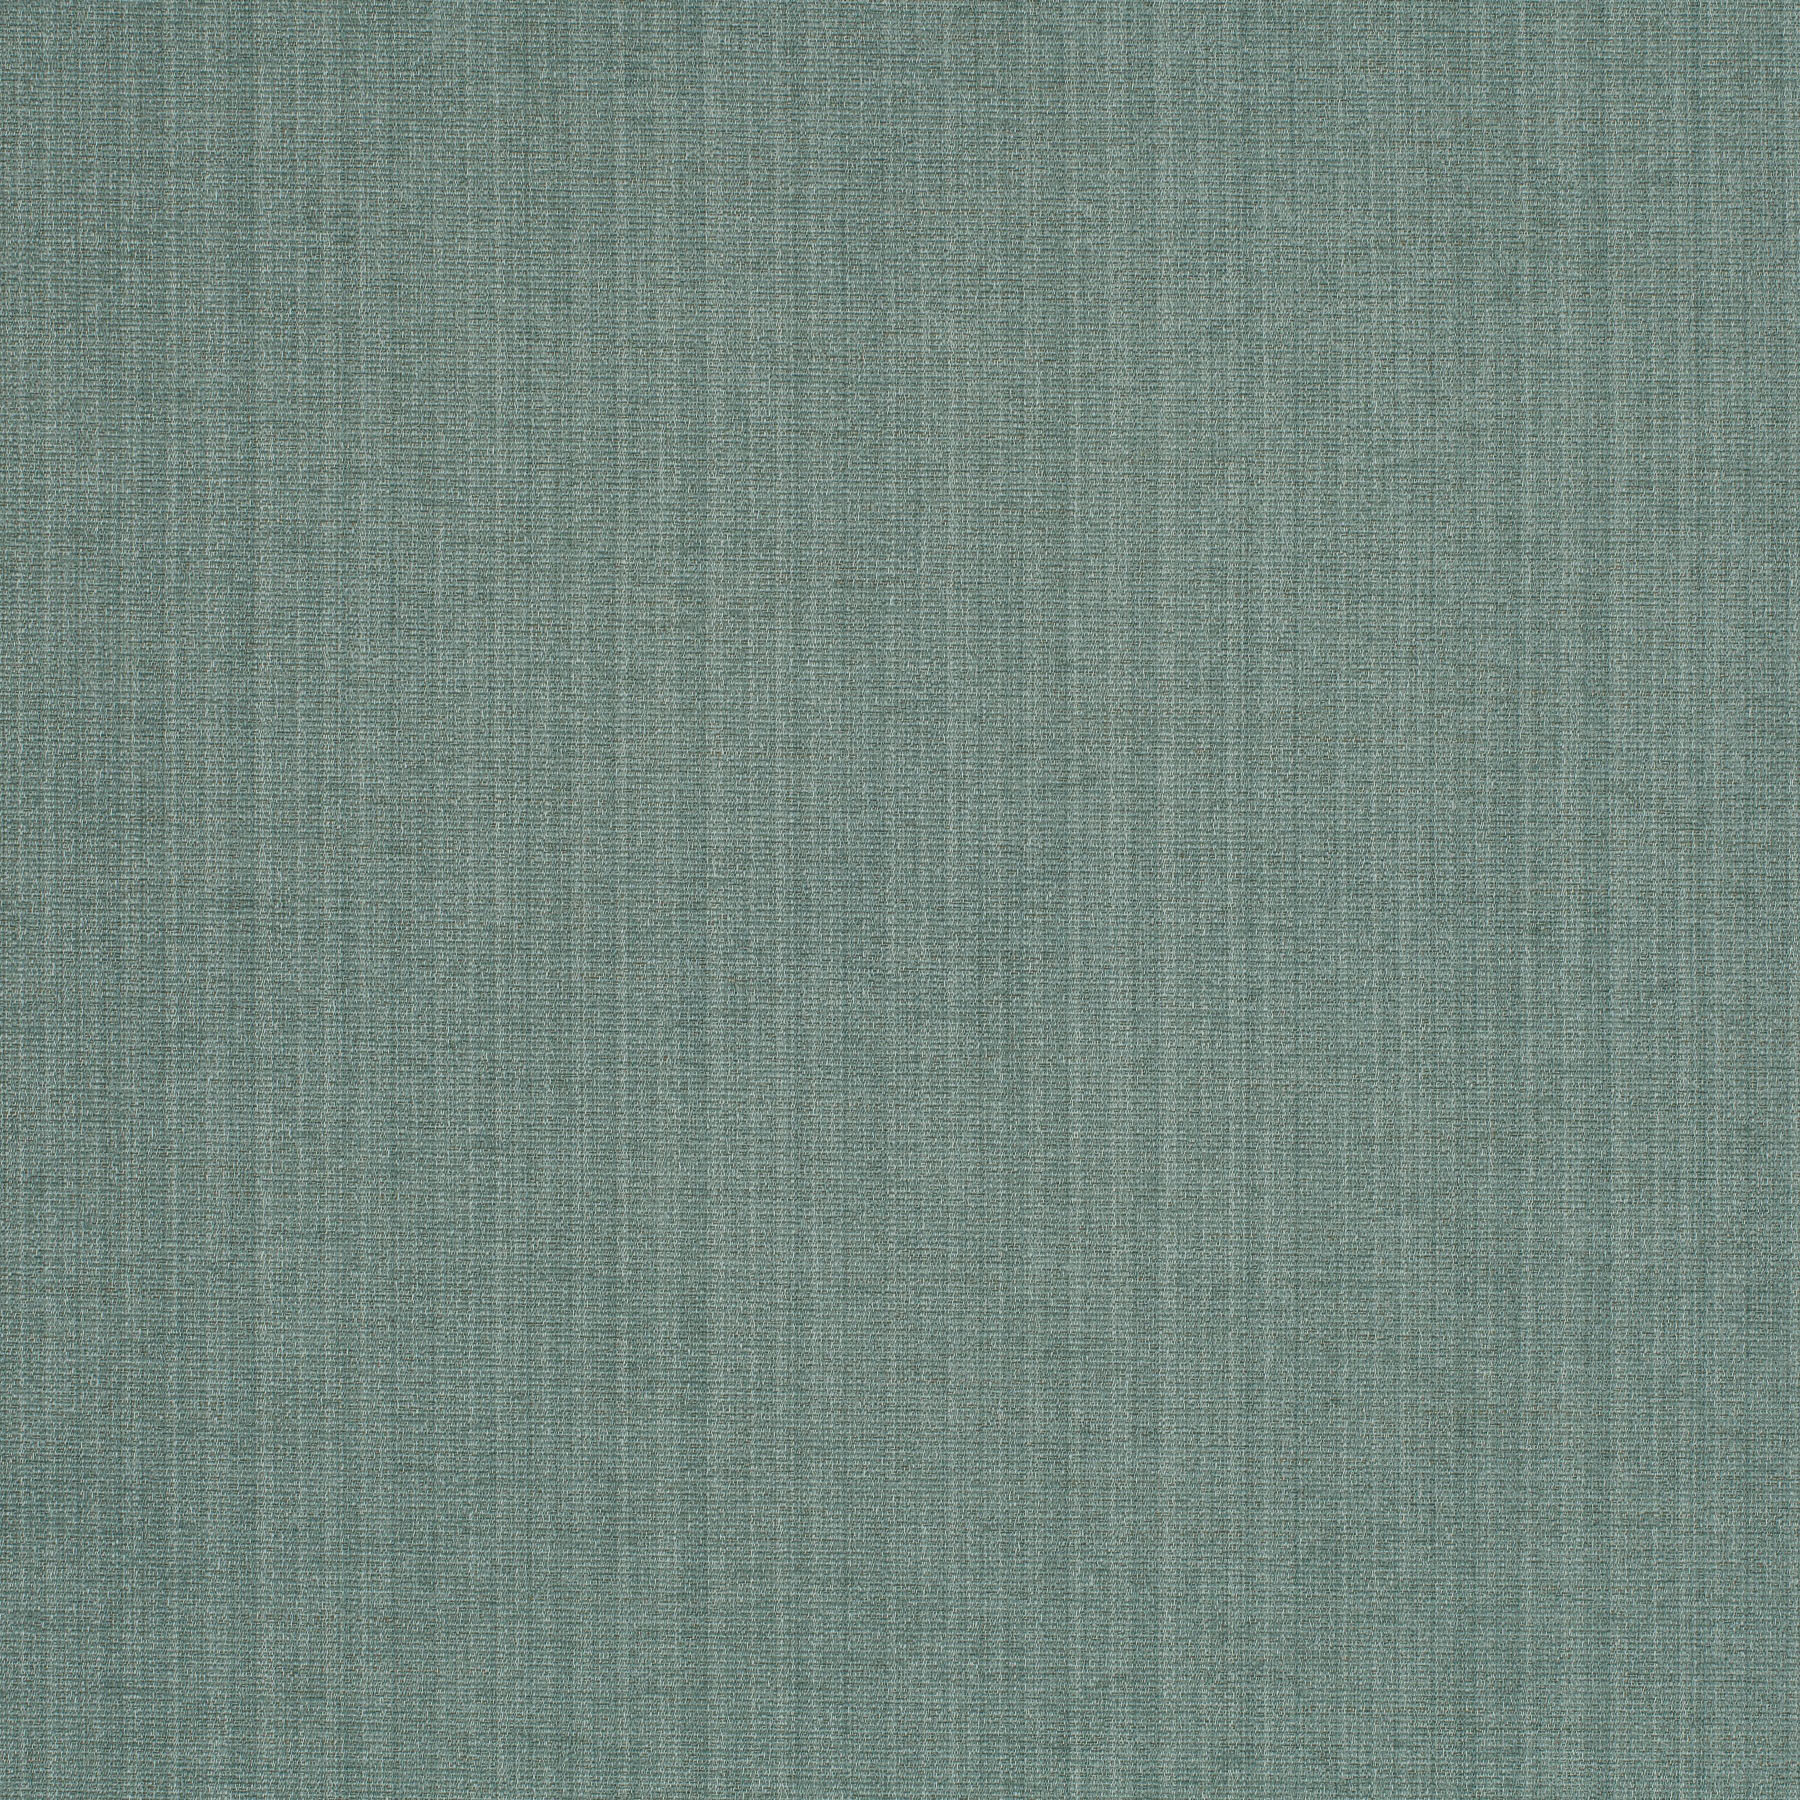 Decoration Fabric Gregory Vol 2 1 6485 033 Jab Anstoetz